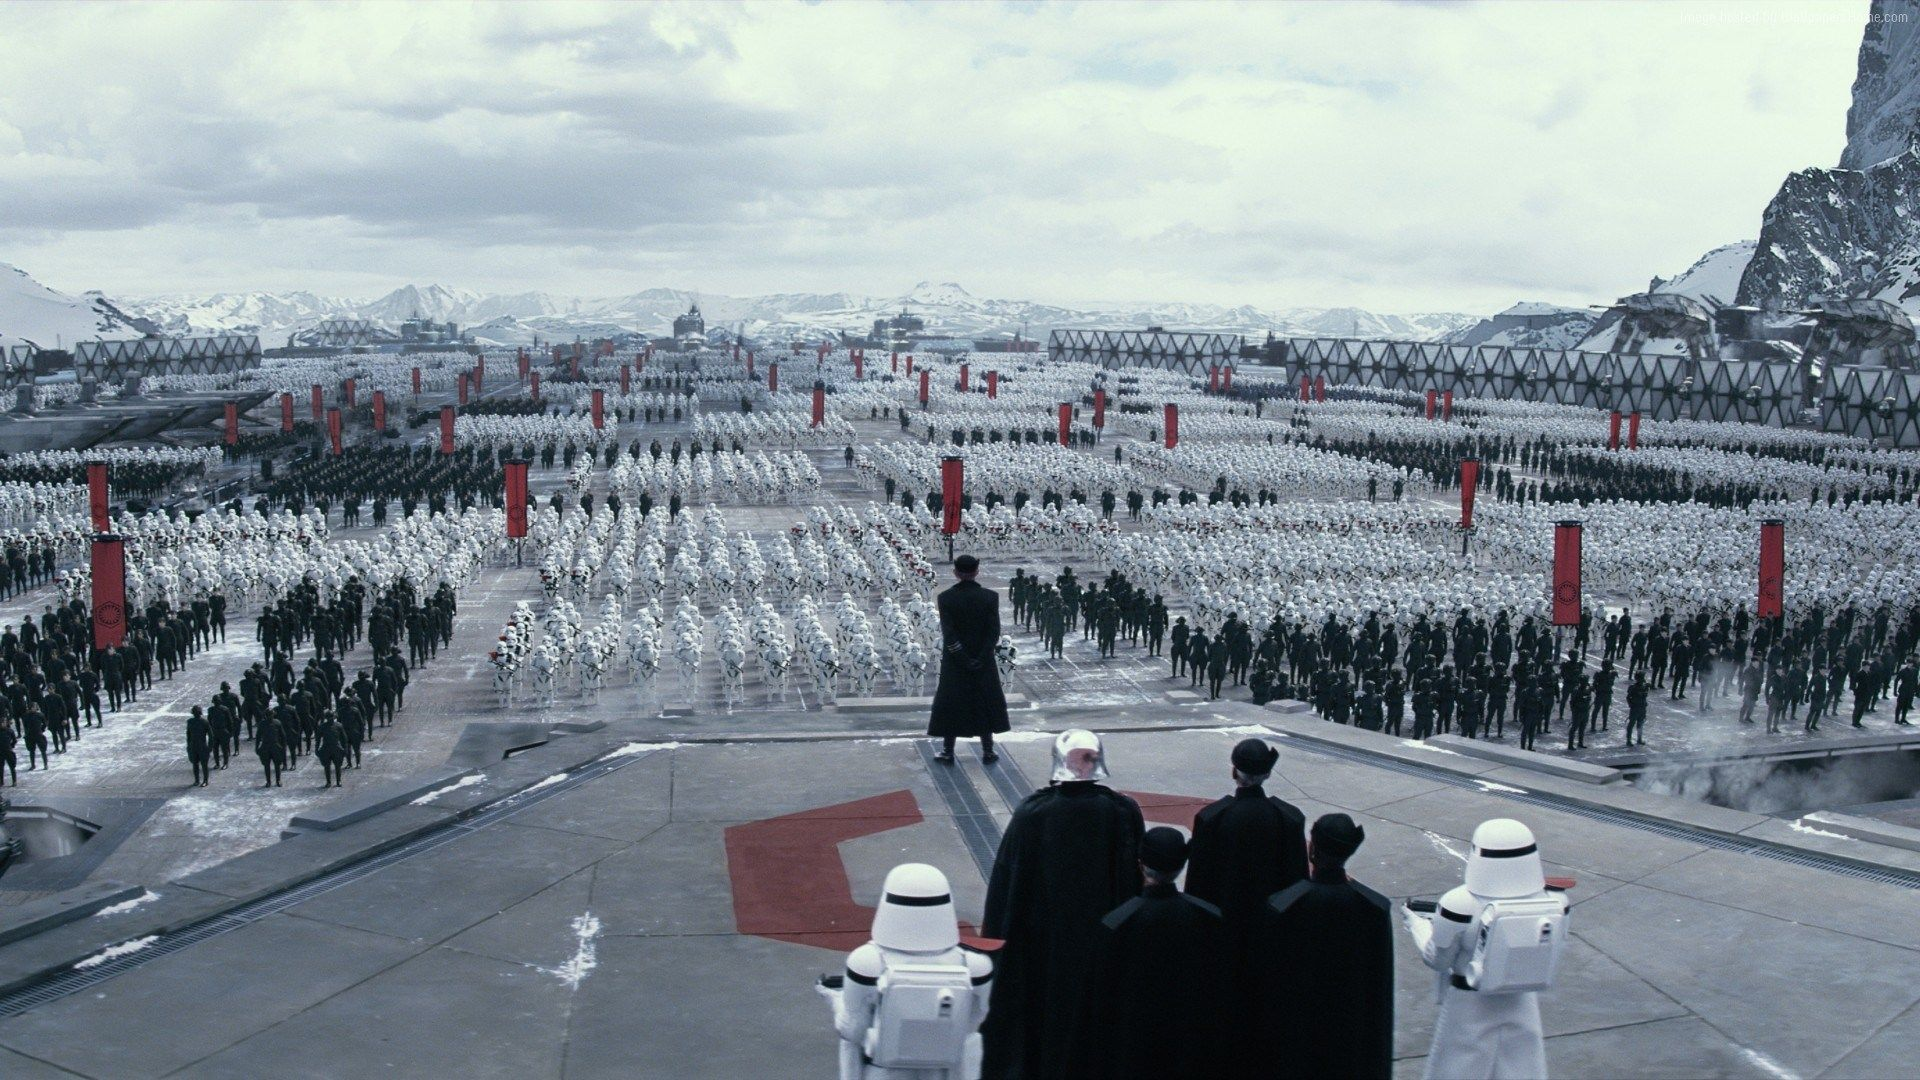 star wars episode vii the force awakens wallpaper movies